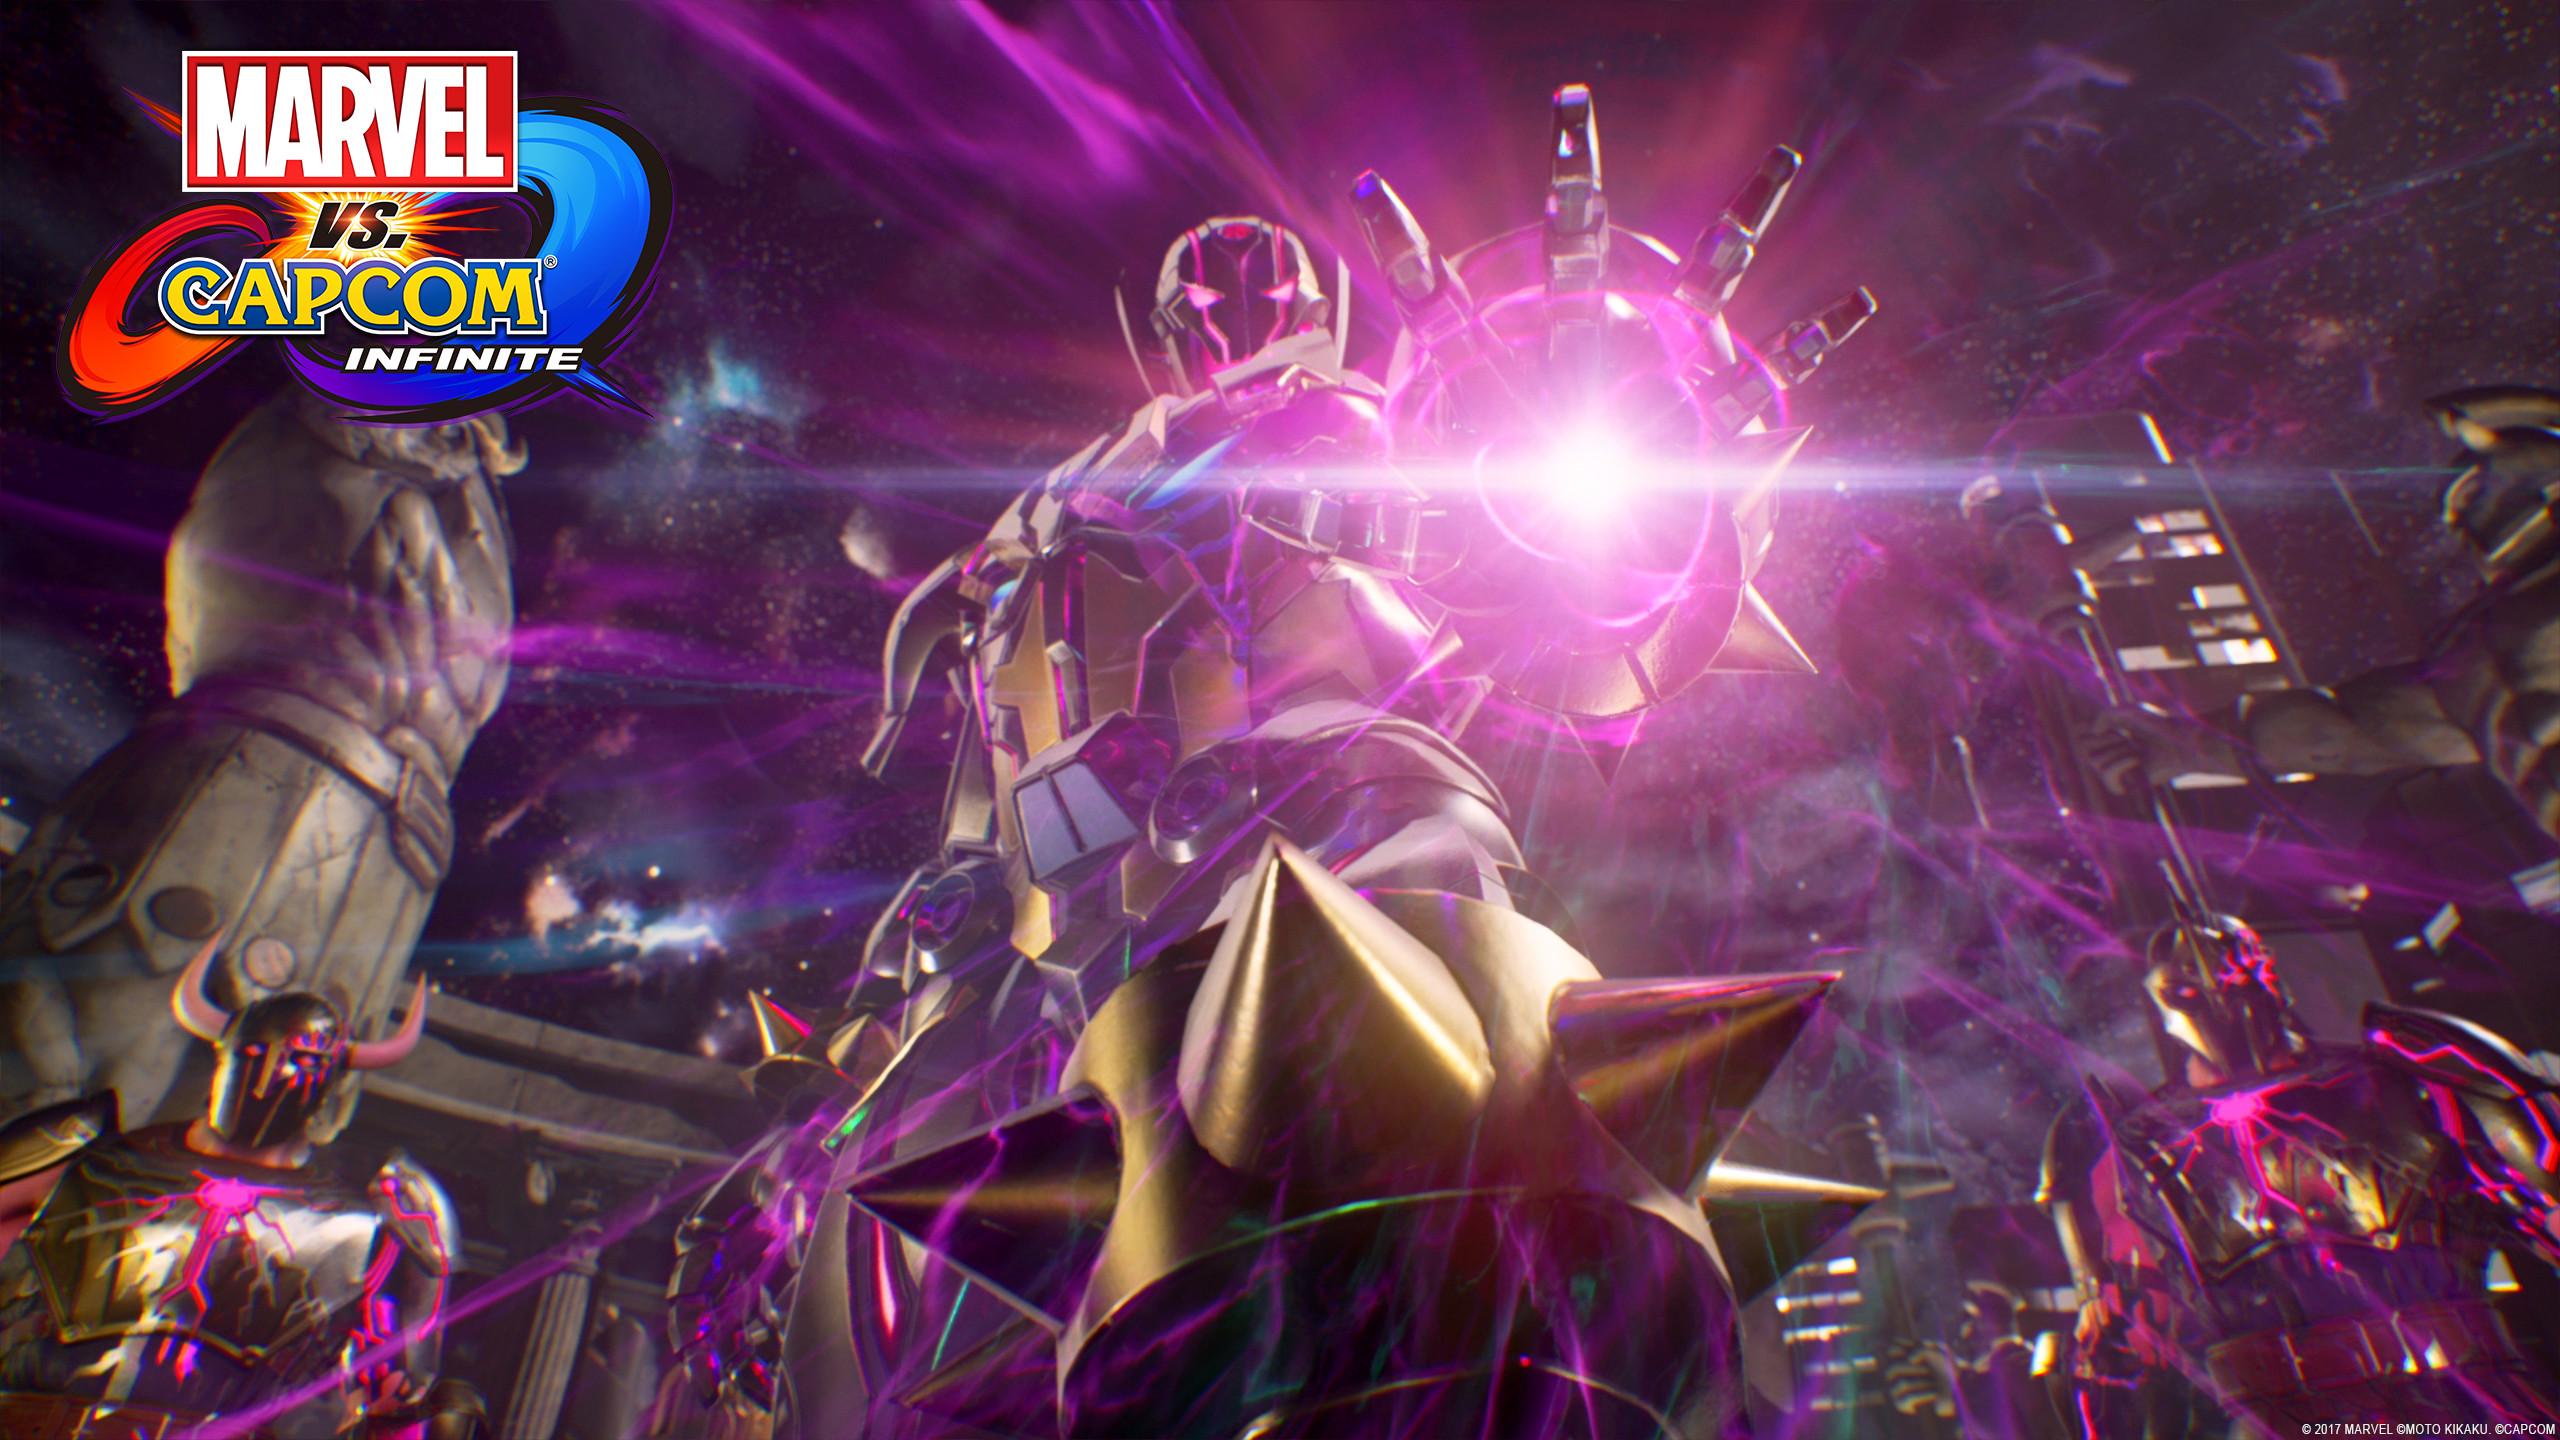 Marvel Vs Capcom Infinite Wallpapers Wallpapertag